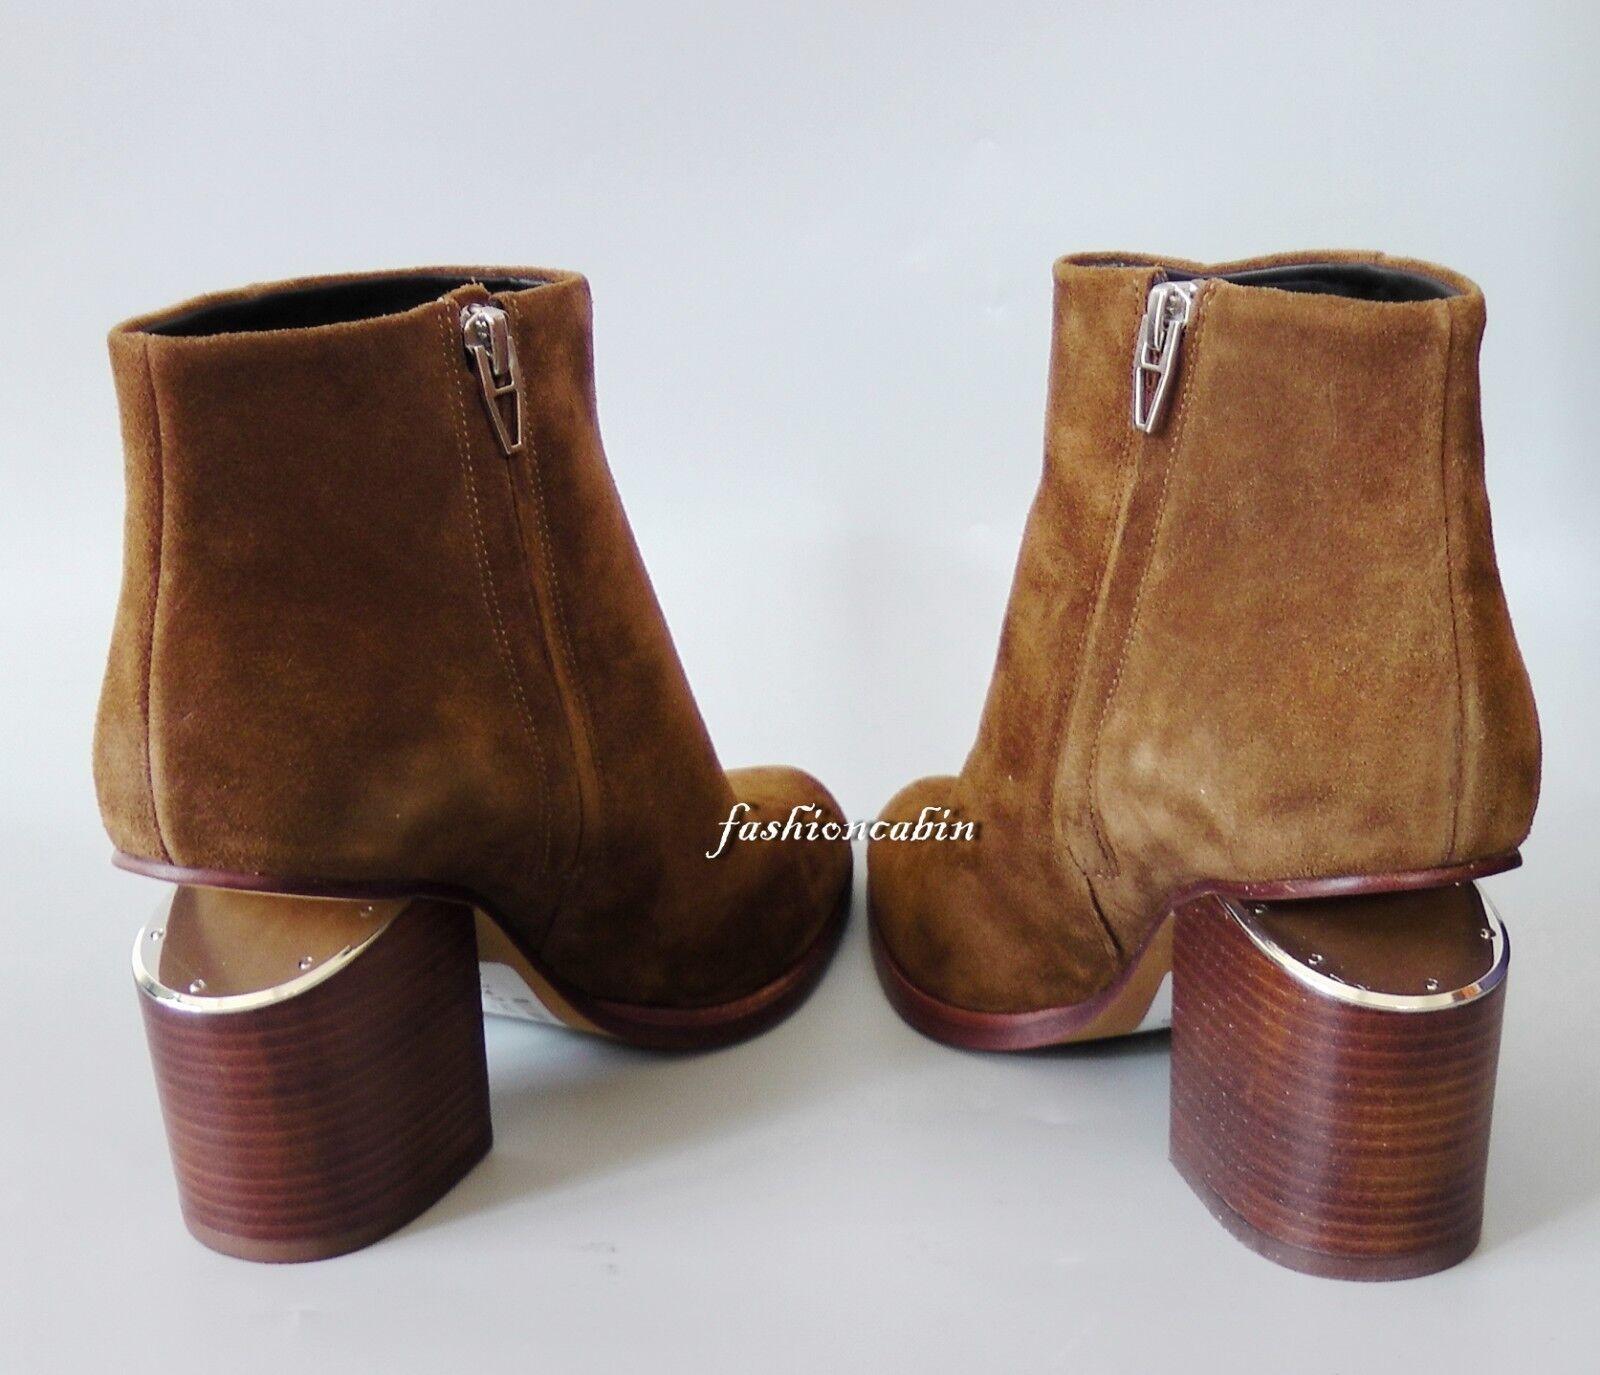 prezzo più economico New ALEXANDER WANG Gabi Suede Ankle Ankle Ankle stivali scarpe, Truffle, EUR 38, retail  675  esclusivo